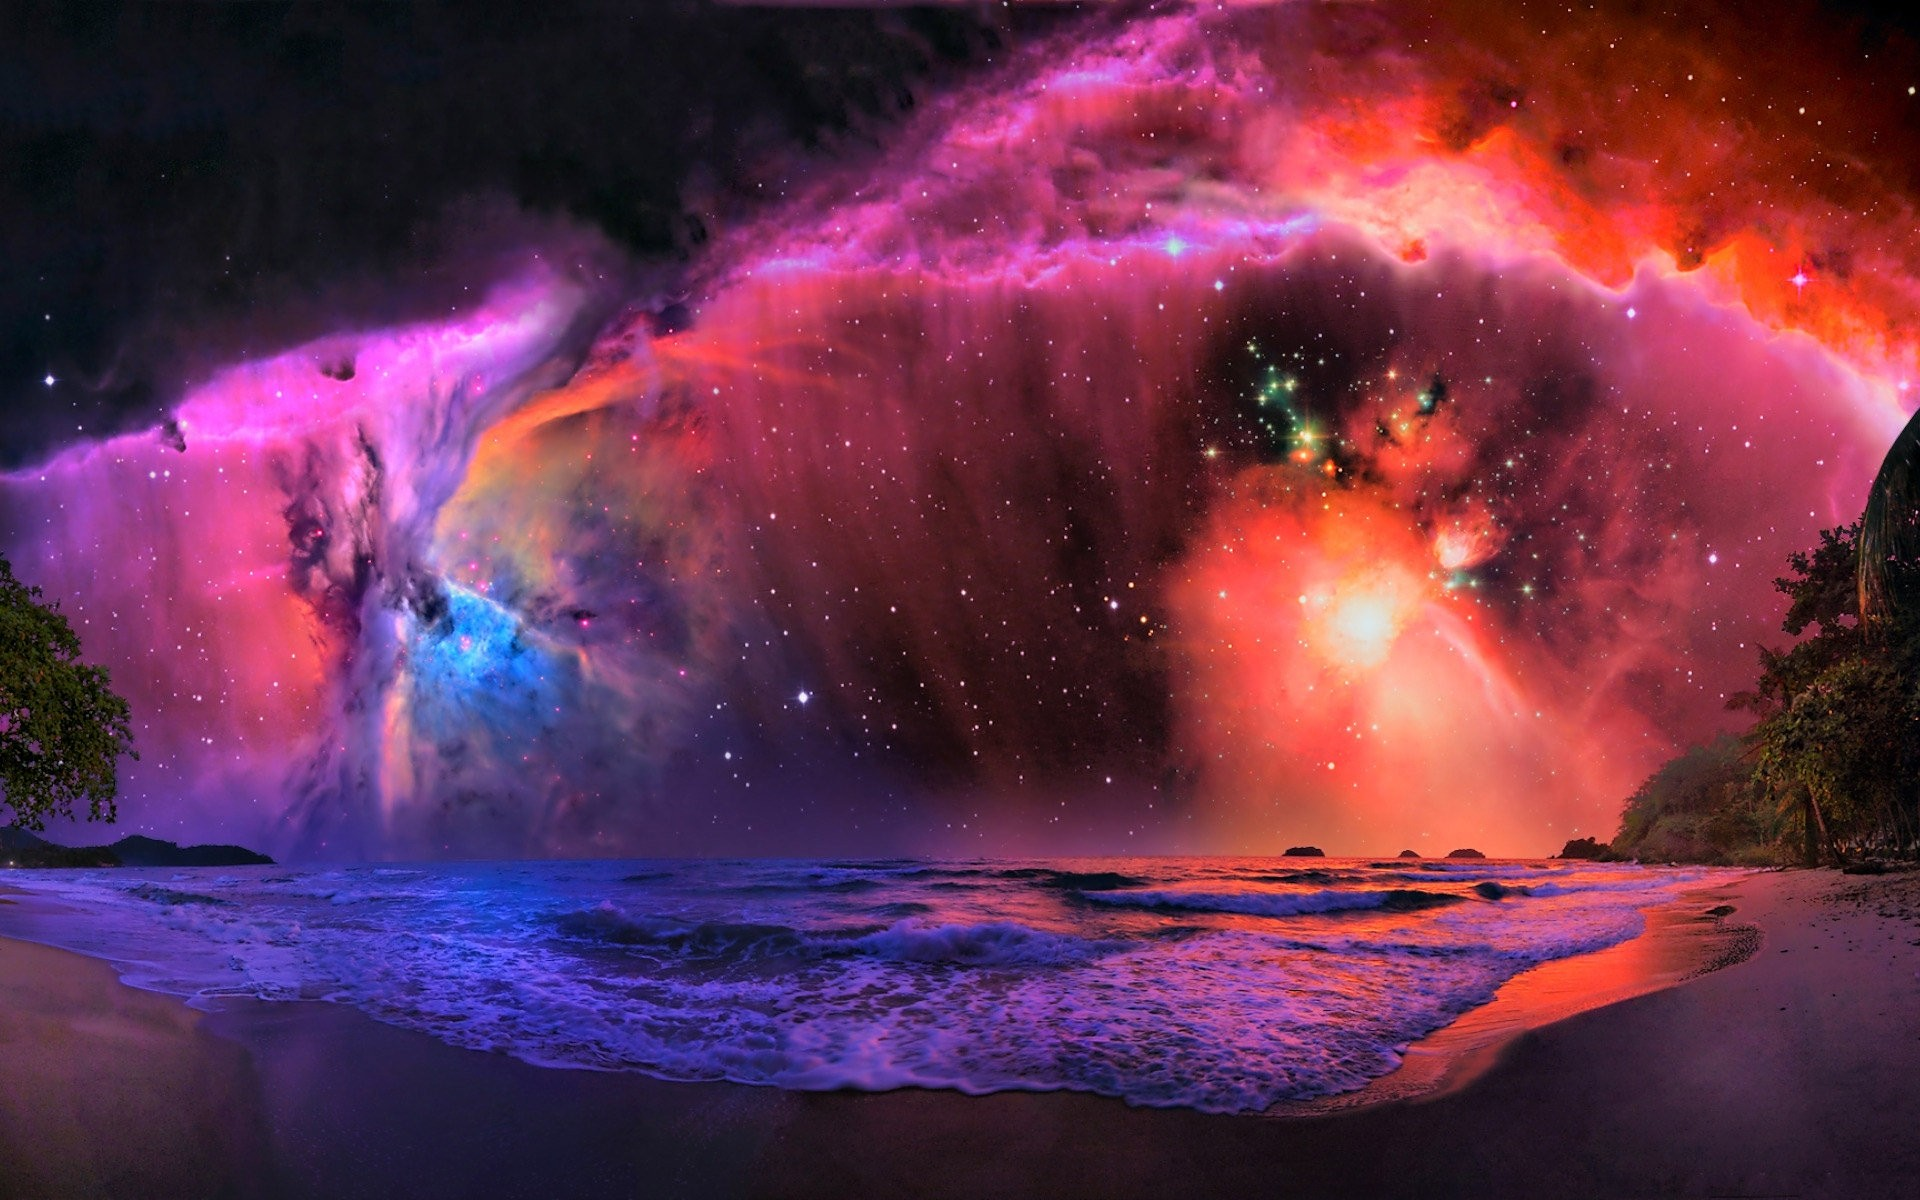 Galaxy Tumblr Background   1758879 1920x1200